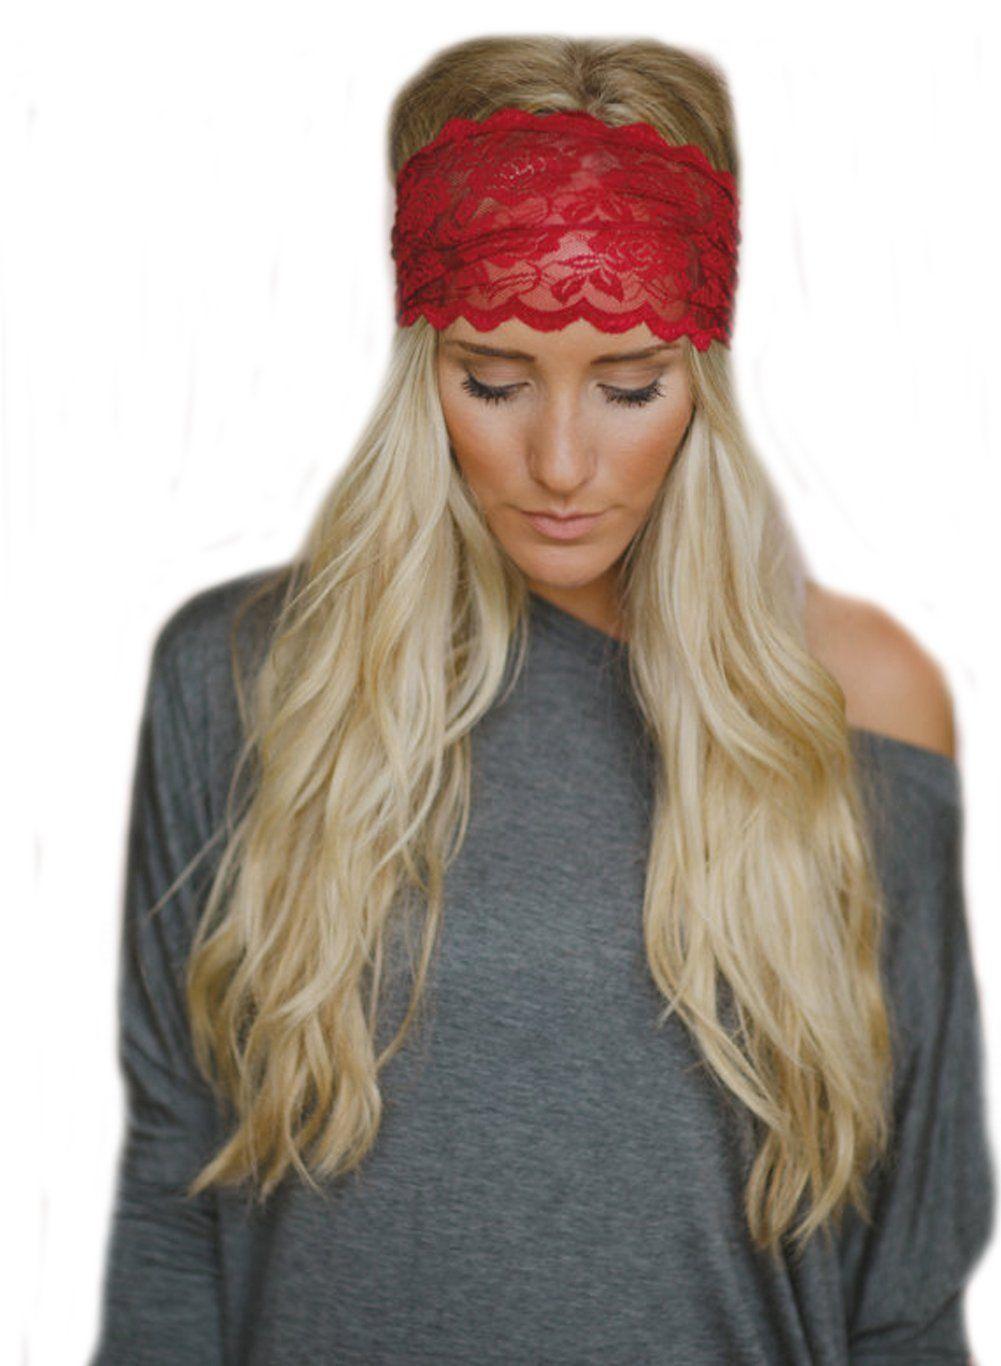 Ewandastore Women 80s Lace Retro Bohemia Headband Turban Twist Head Wrap  Headband Head Scarf Twisted Knotted Soft Hair Band(Dark Red)    Read more  details ... 1035ef75544